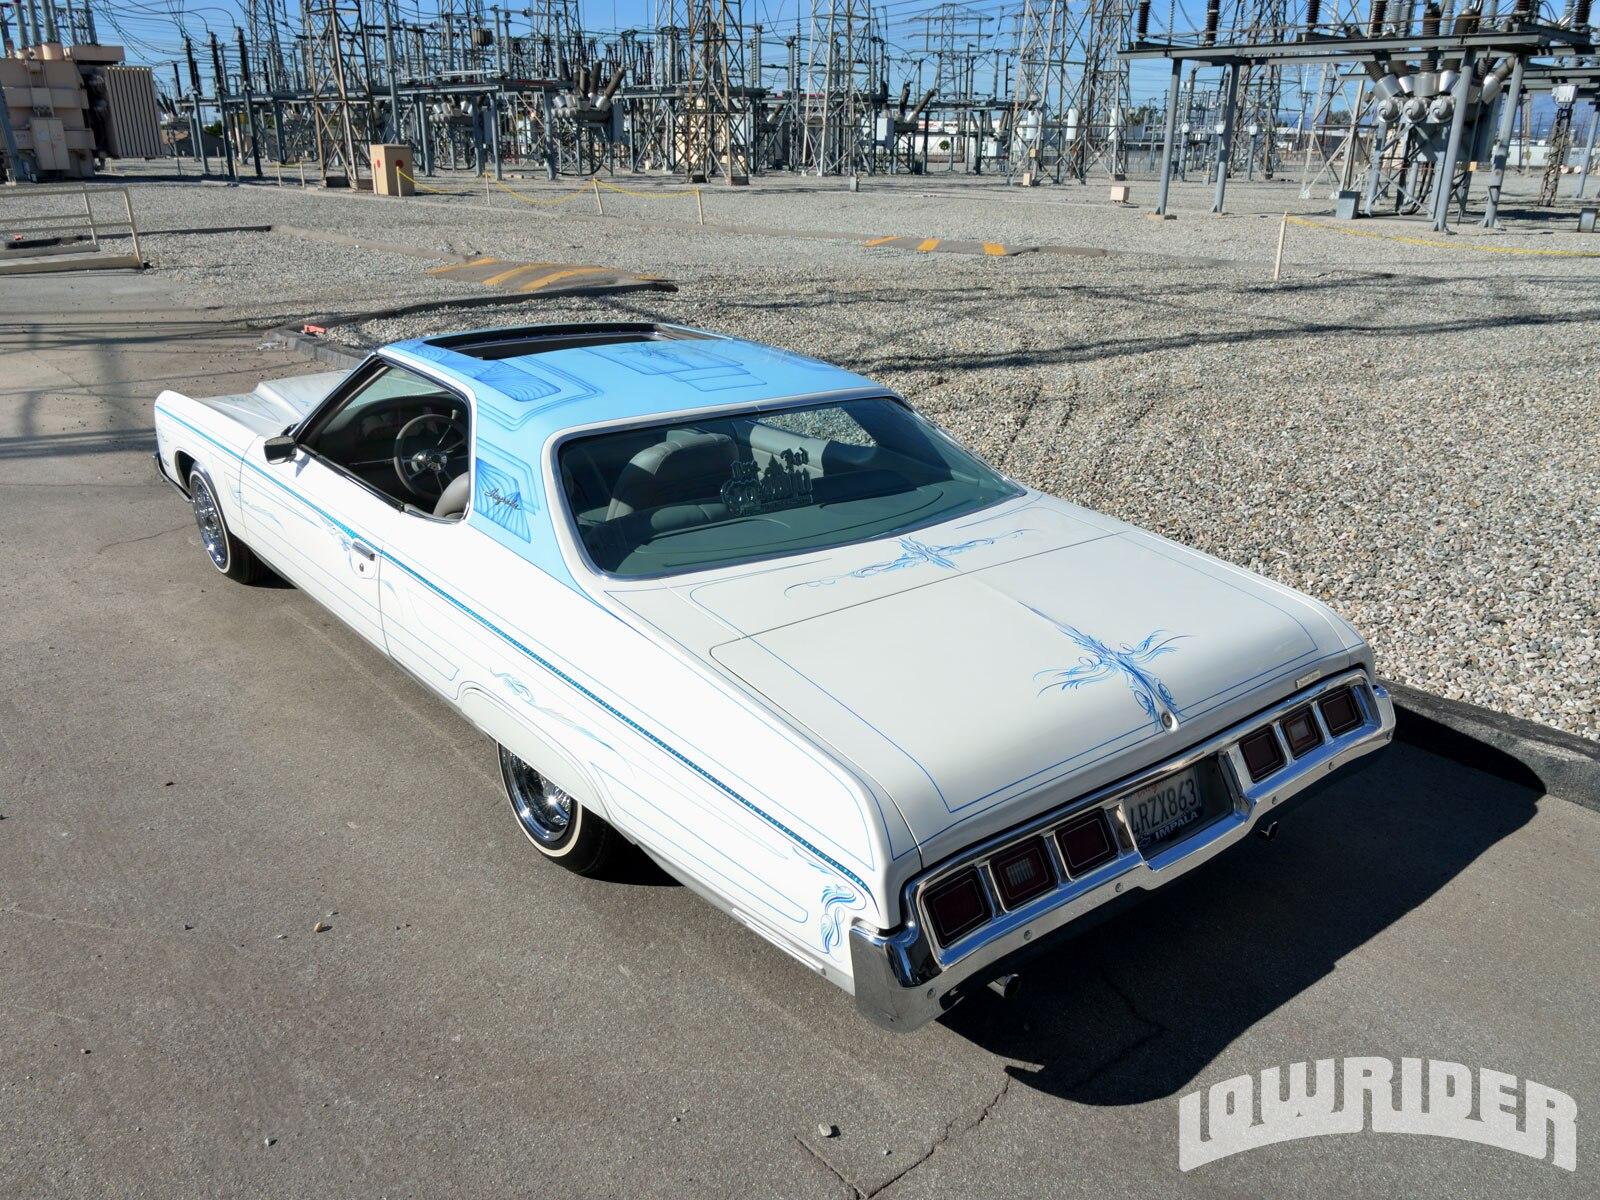 1208-lrmp-07-o-1972-chevrolet-impala-custom-rear-view1